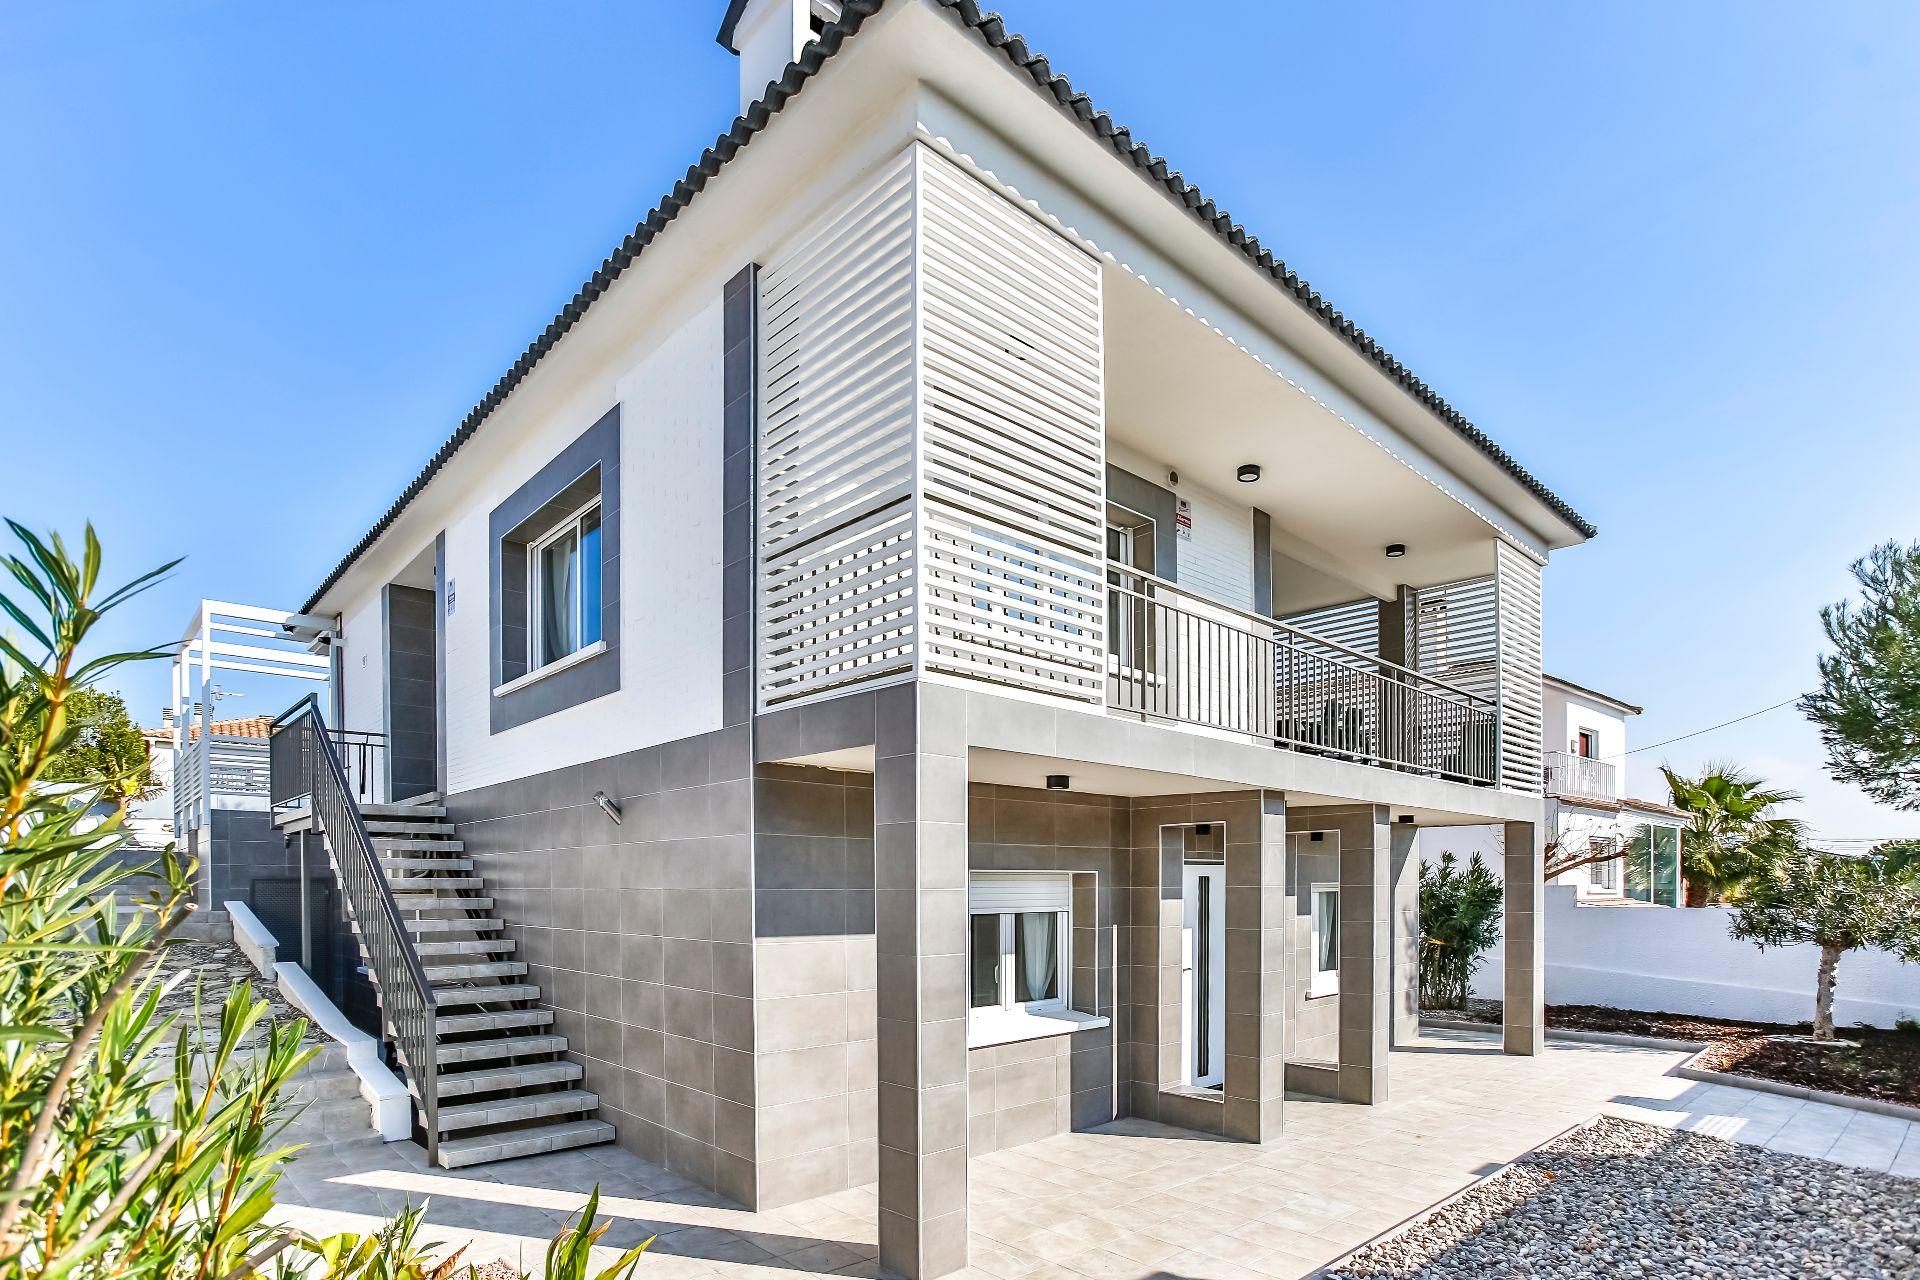 Casa / Chalet en Calafell, Residencial Calafell, venta